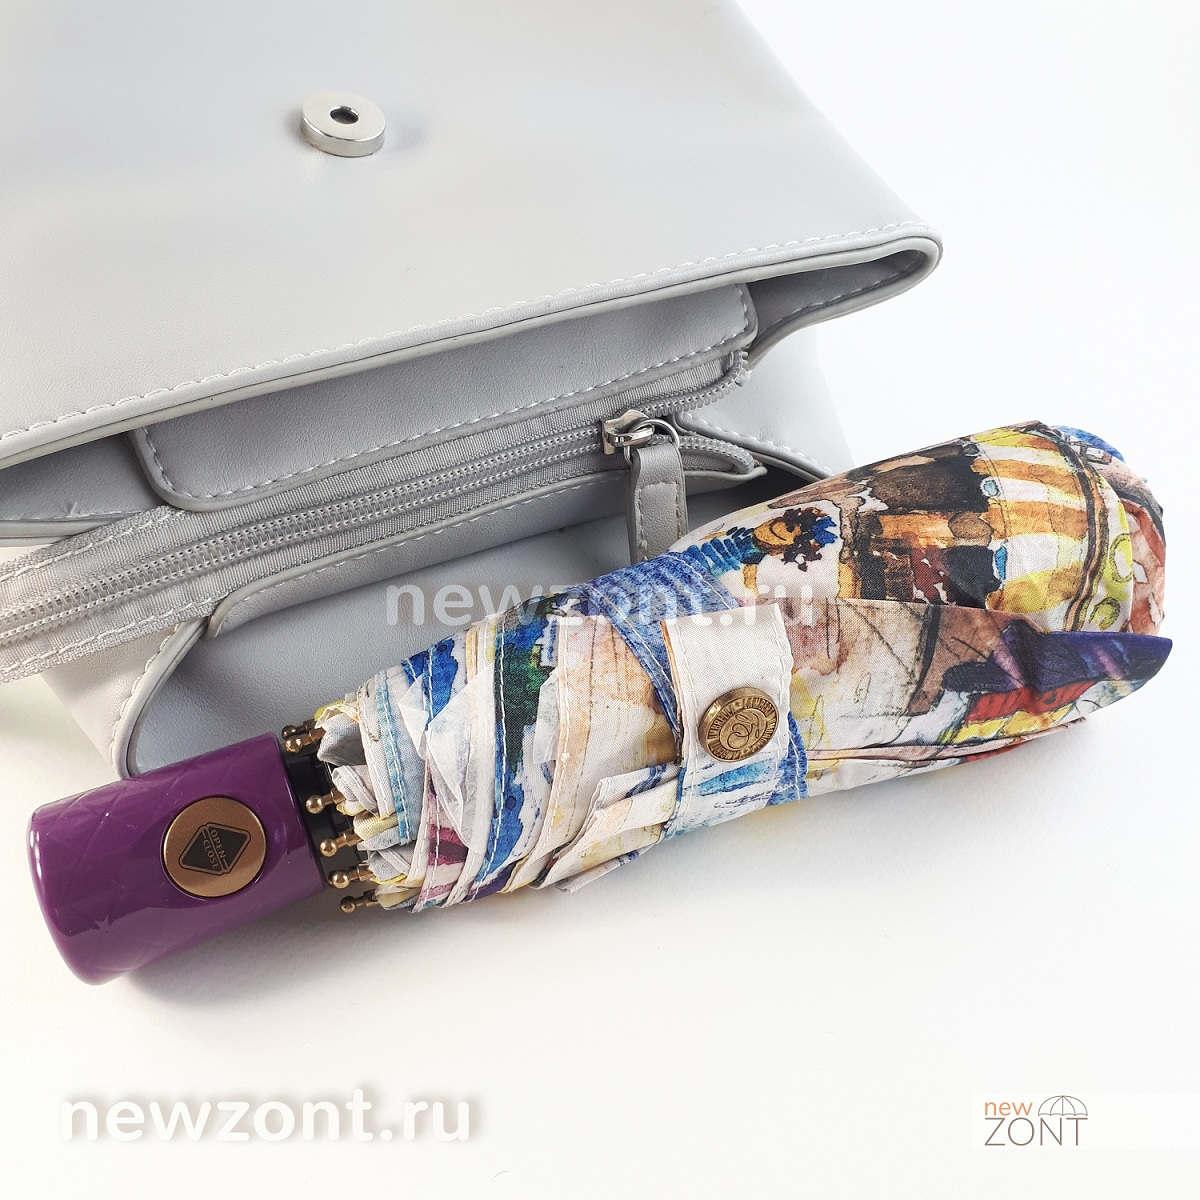 Легкий зонтик автомат Lamberti